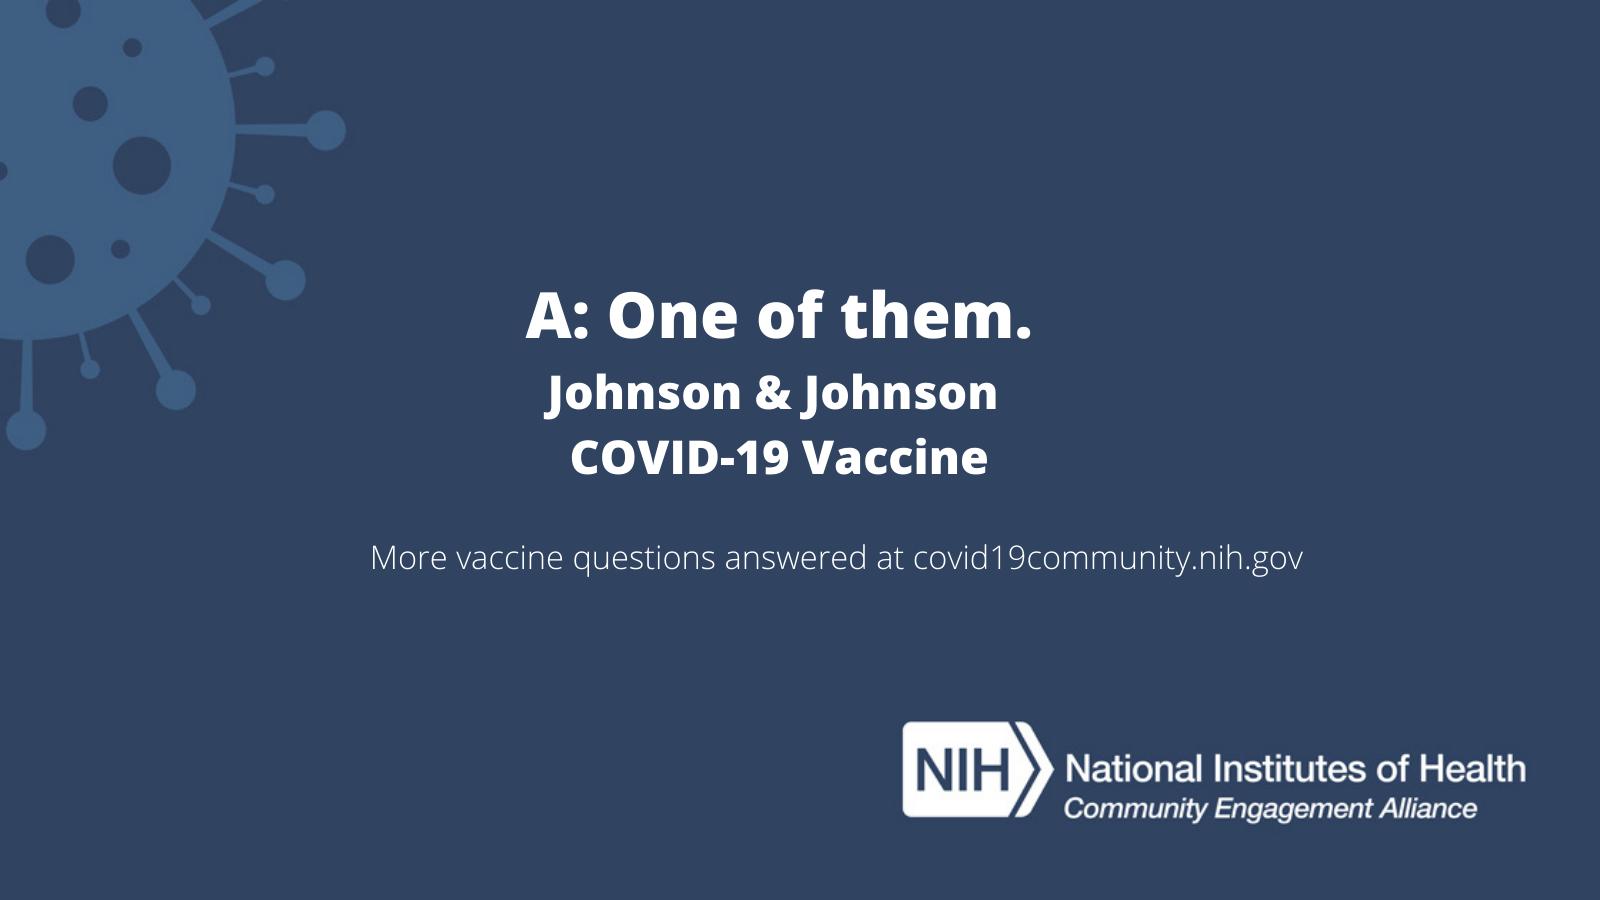 A: One of them. Johnson & Johnson COVID-19 Vaccine. More vaccine questions answered at covid19community.nih.gov